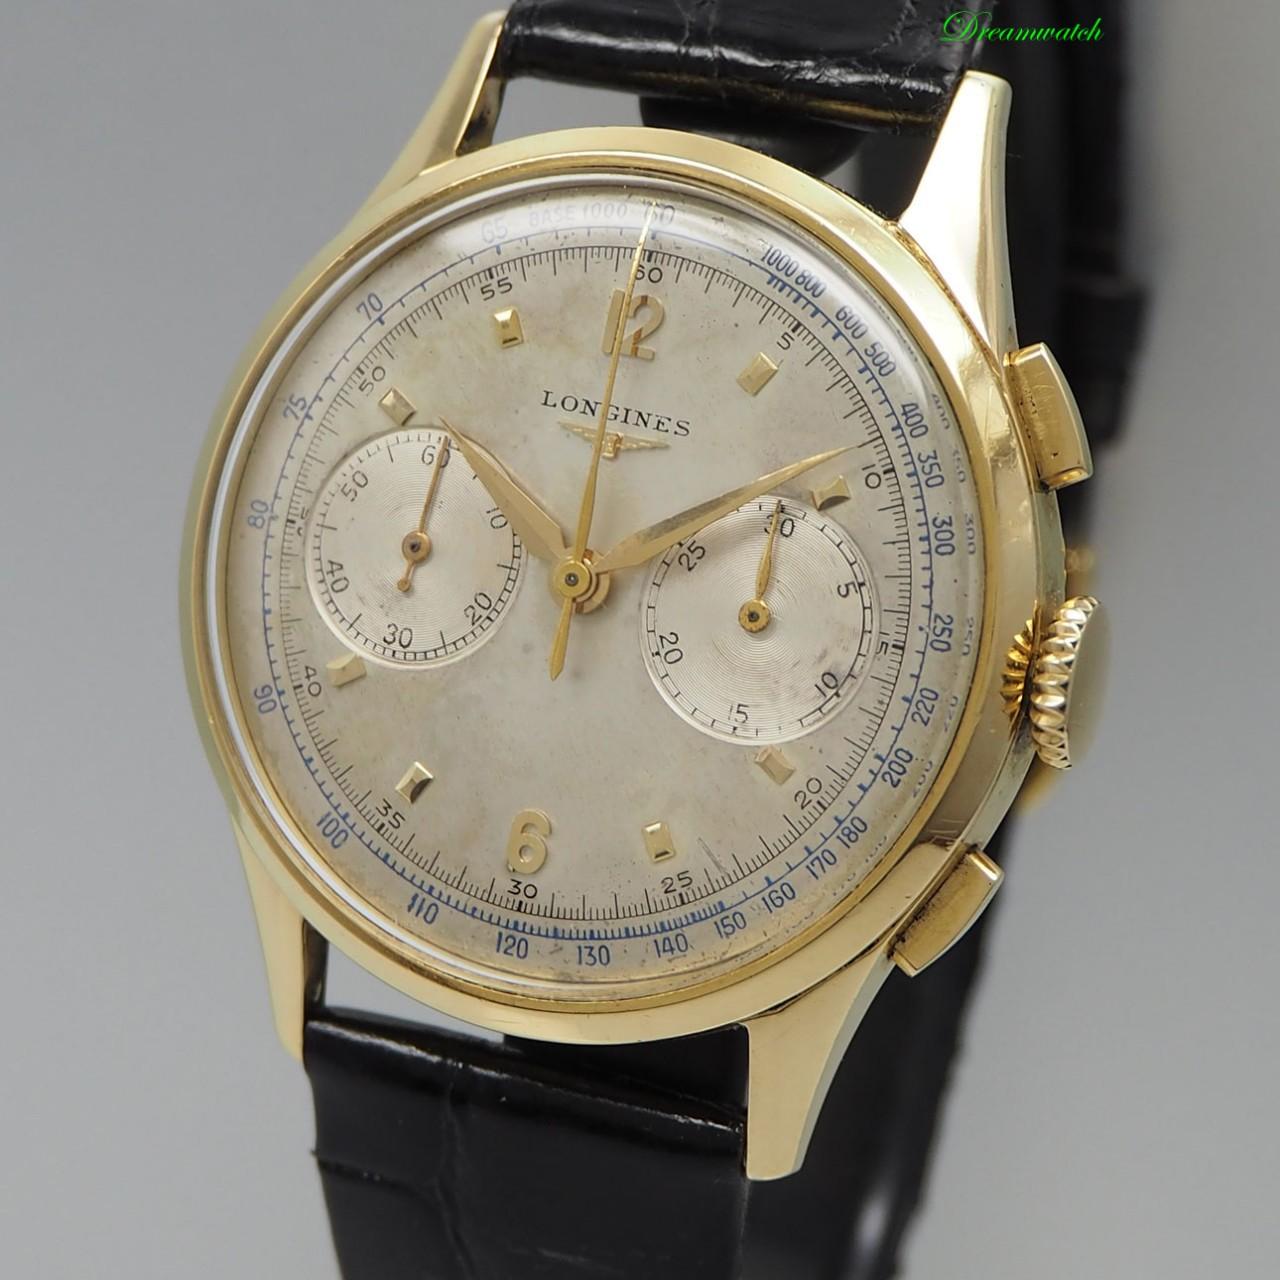 Longines Vintage Chronograph 18k/750 Gold - CH30